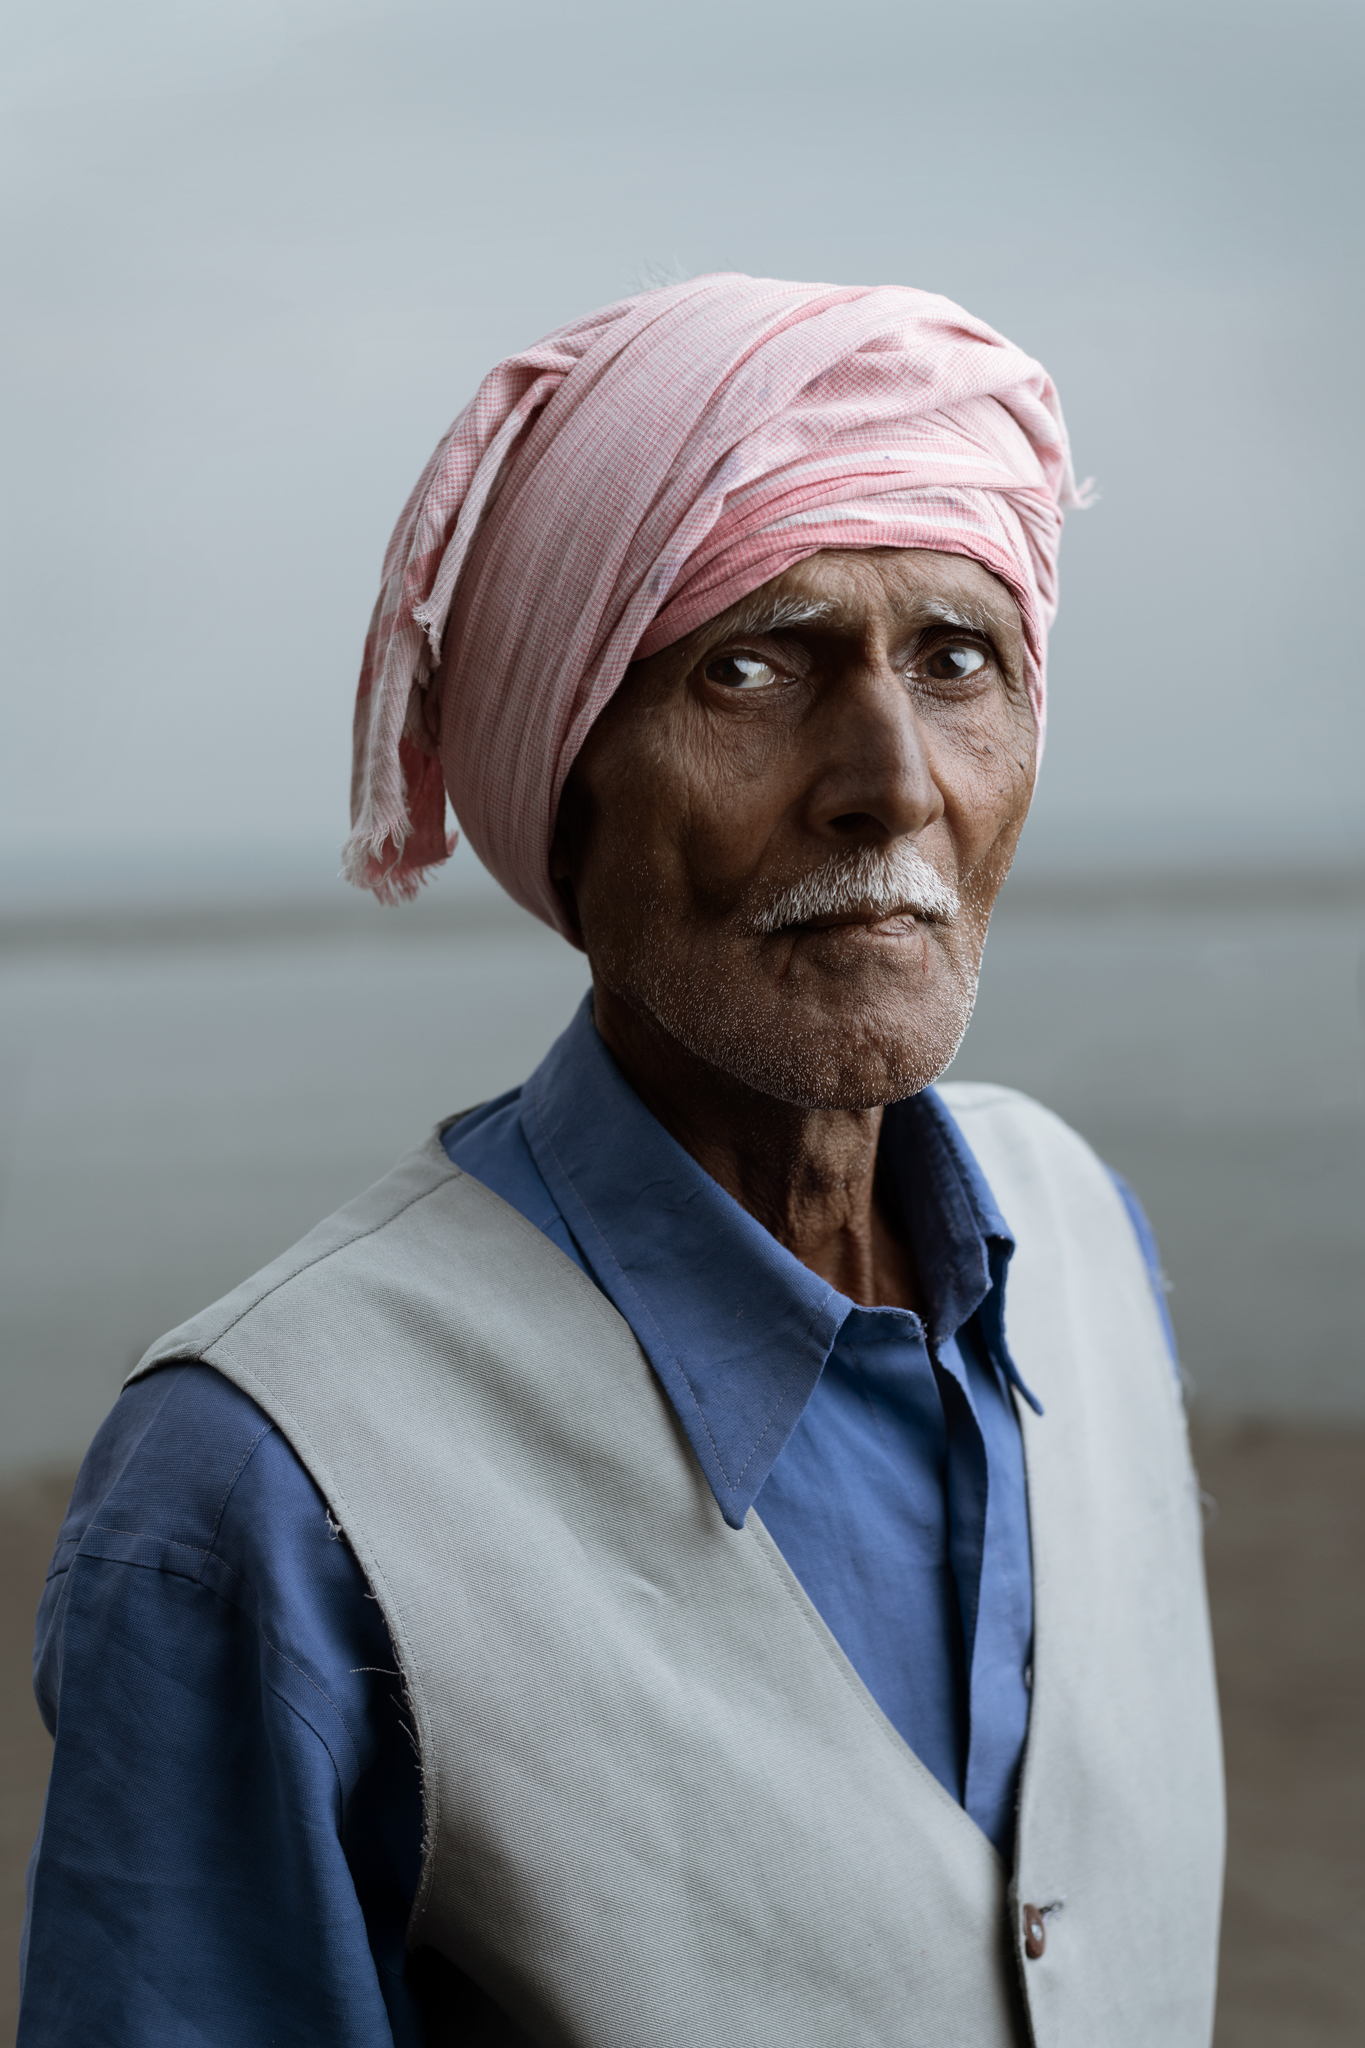 Varanasi_portrait_travel_photography_Manchester_Adventure_Photographer_Jan_Bella15.jpg